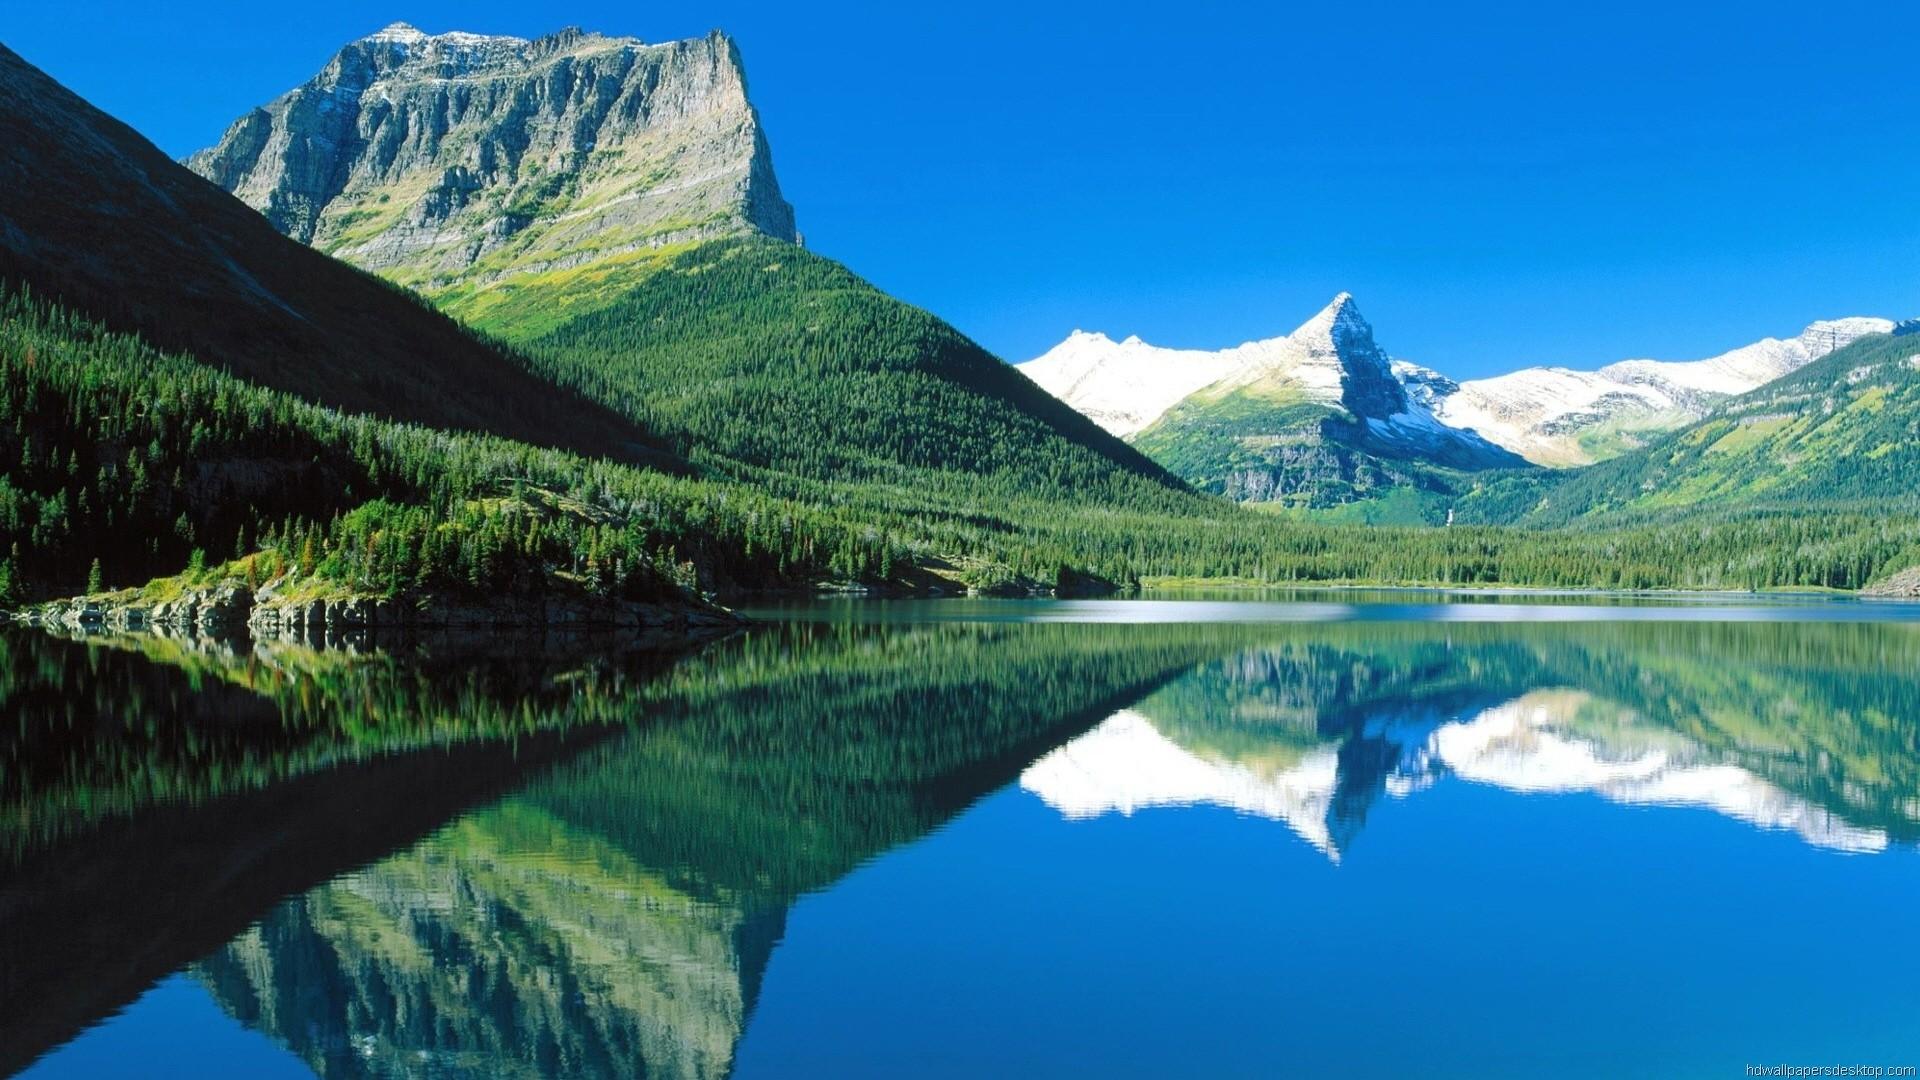 1080p Nature Wallpaper 67 Images